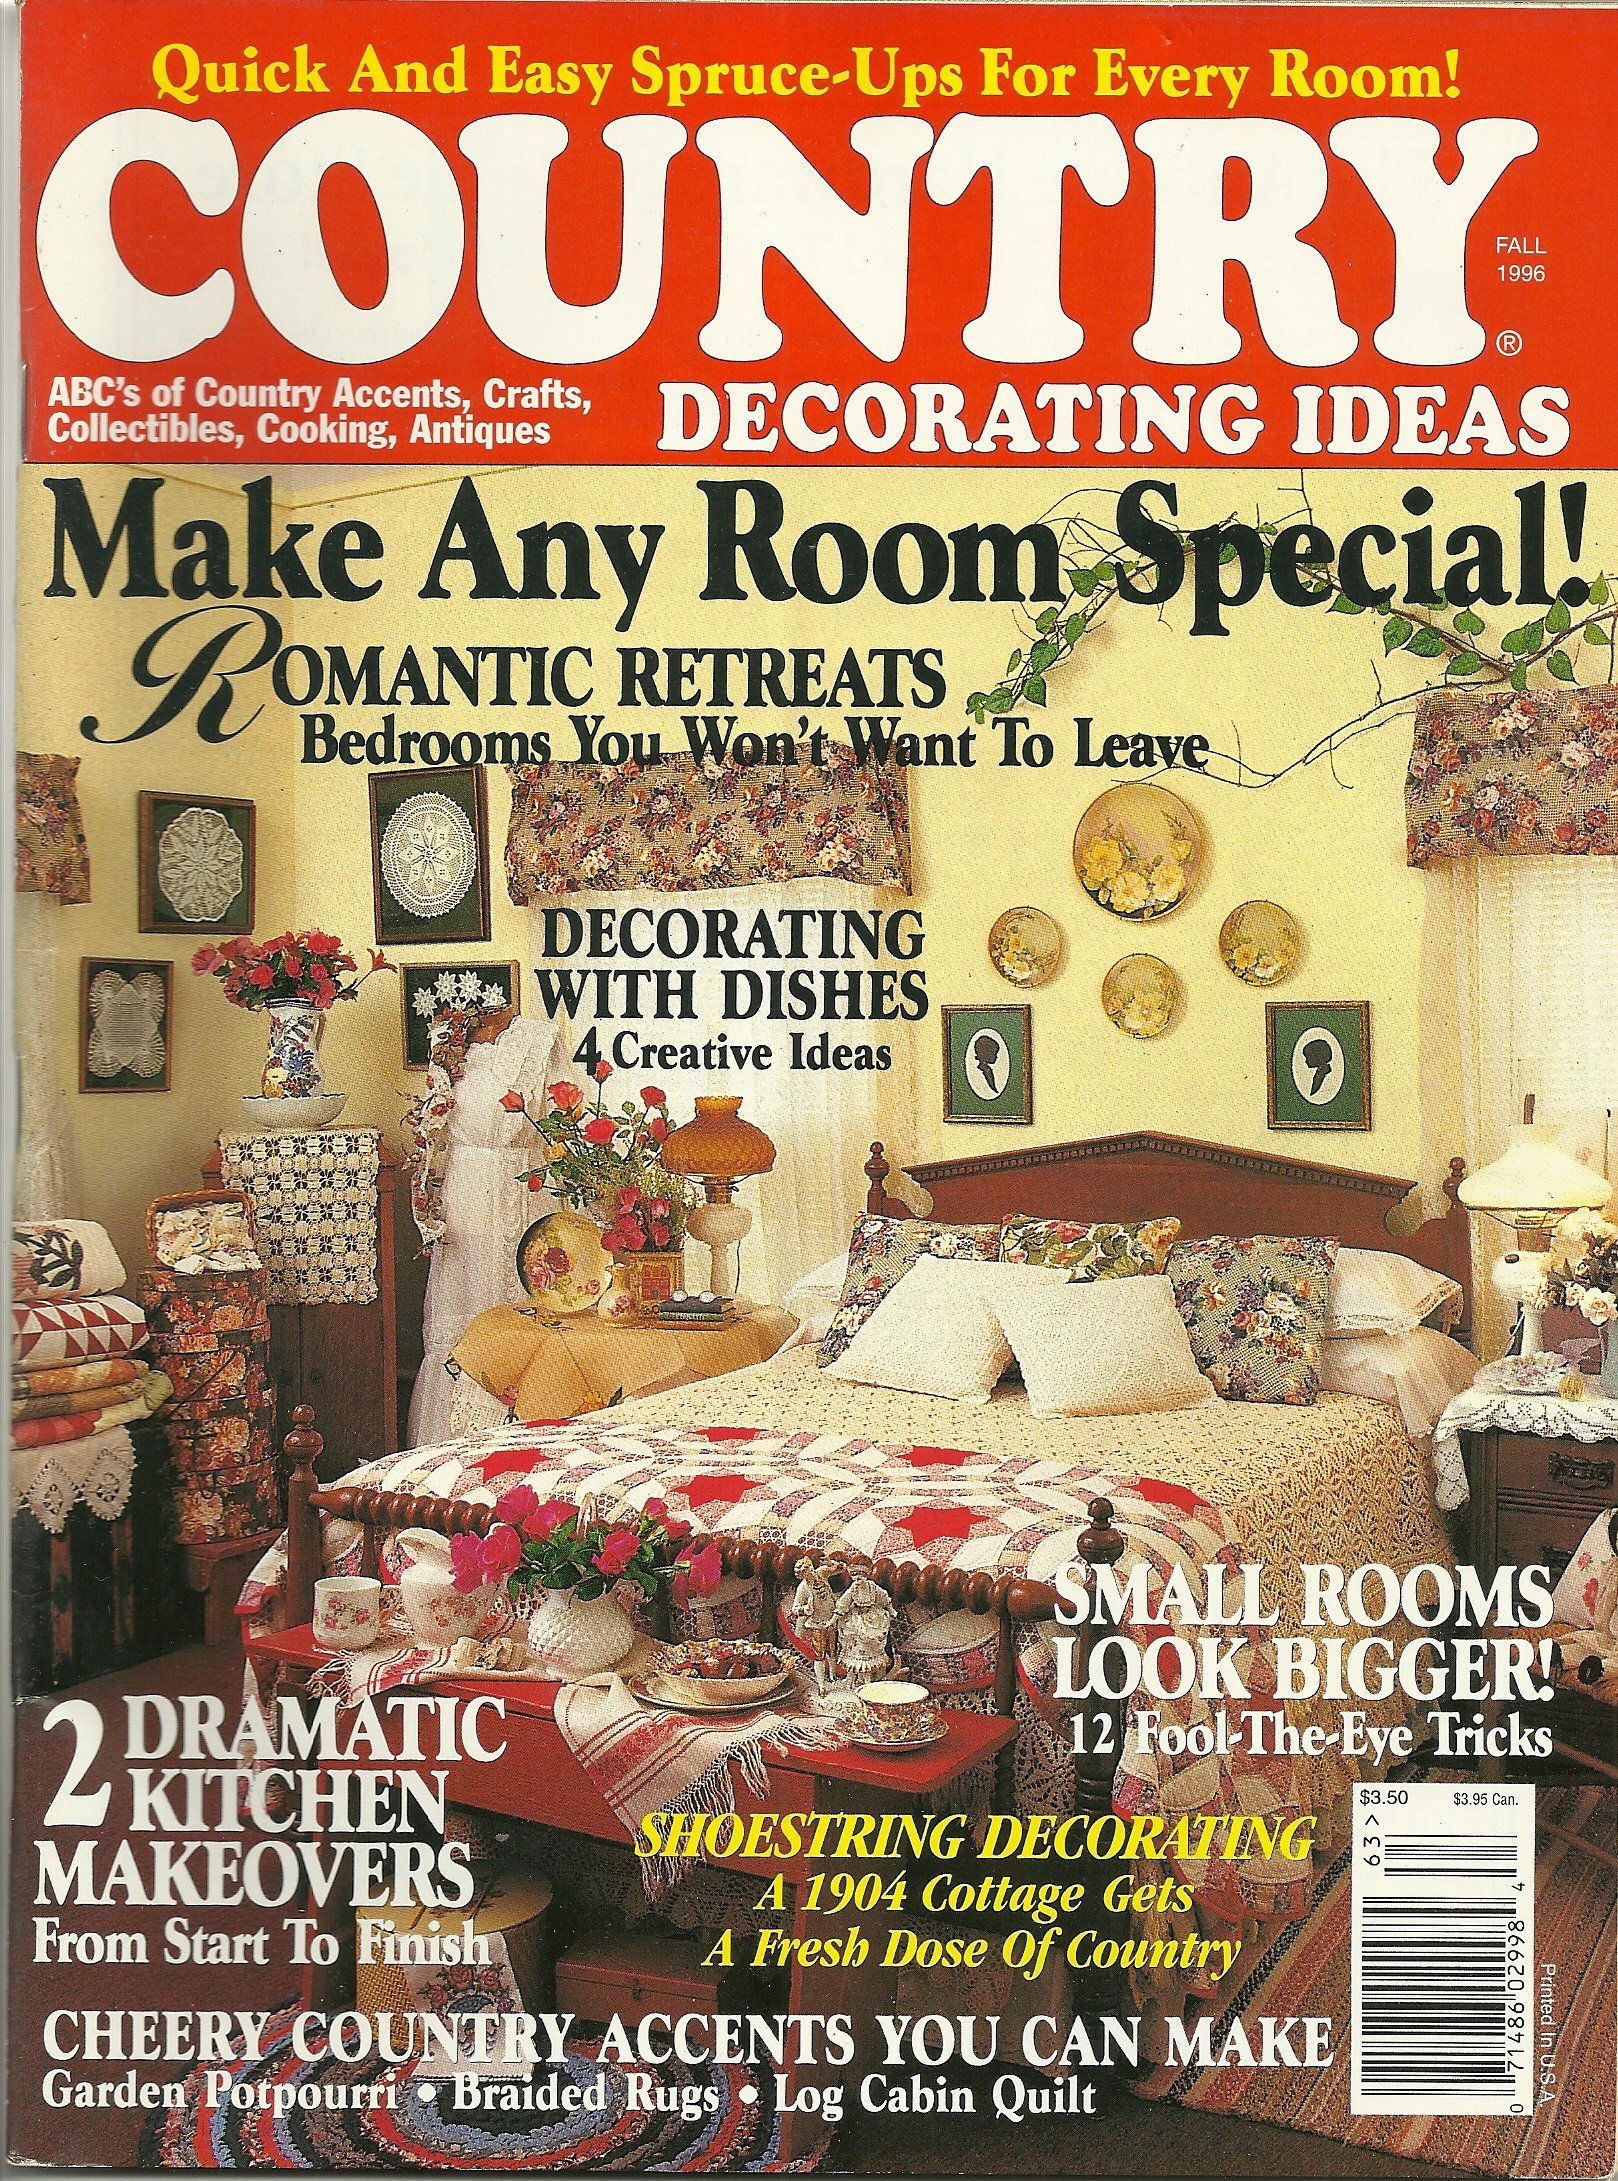 Country Decorating Ideas Magazine - Fall 1996: Amazon.com: Books